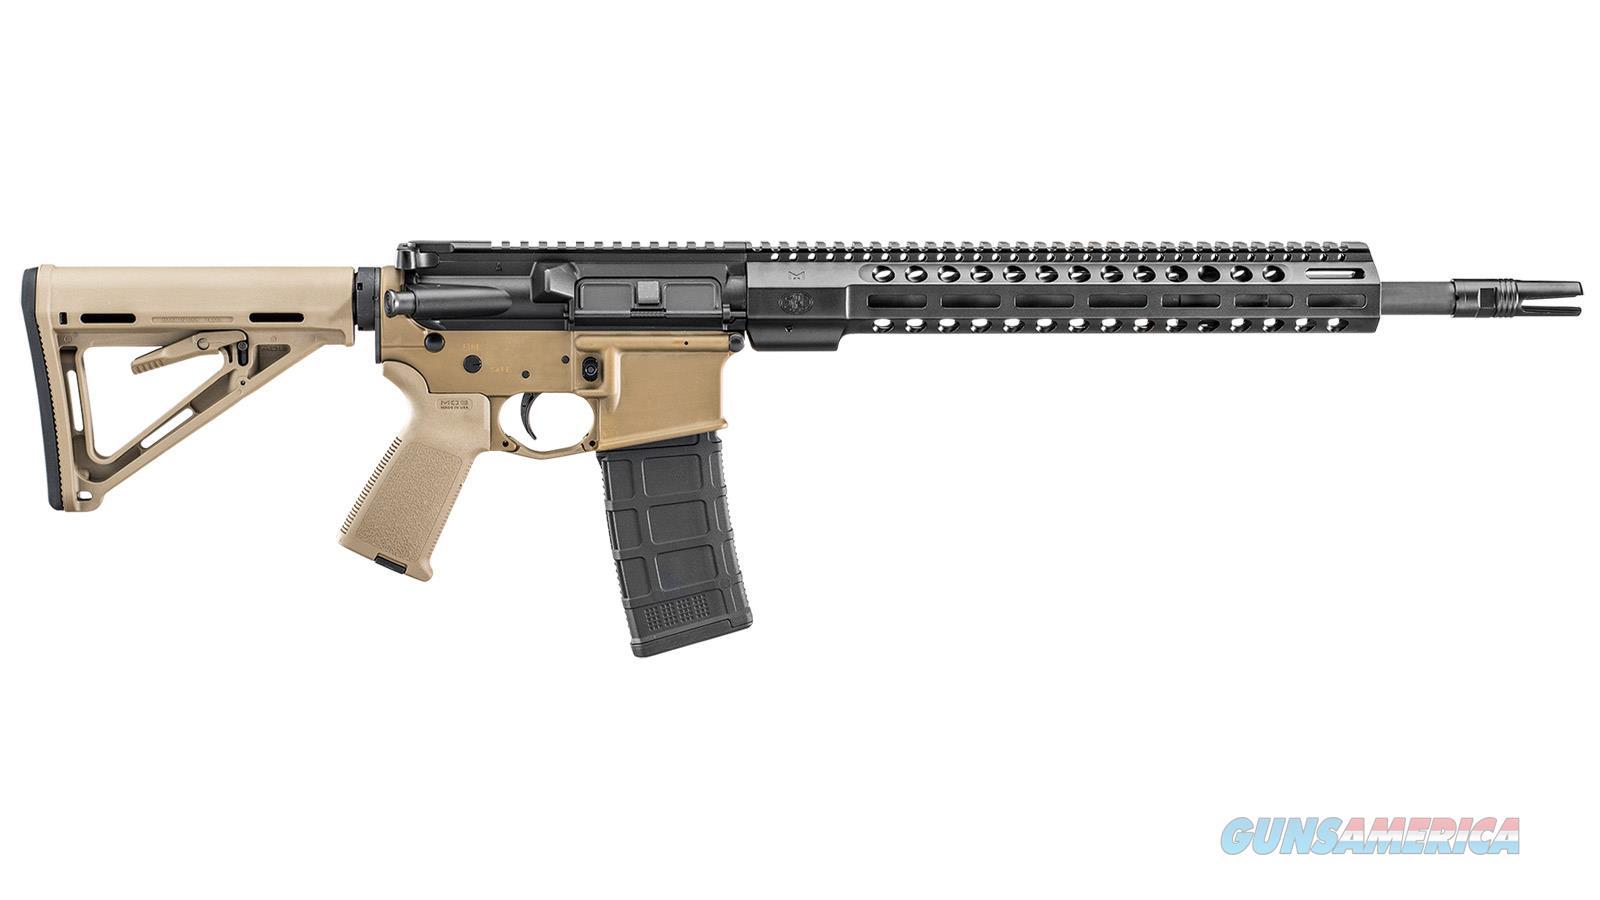 Fn Manufacturing Fn15 Tact Carbine Ii 5.56 3631209  Guns > Rifles > F Misc Rifles